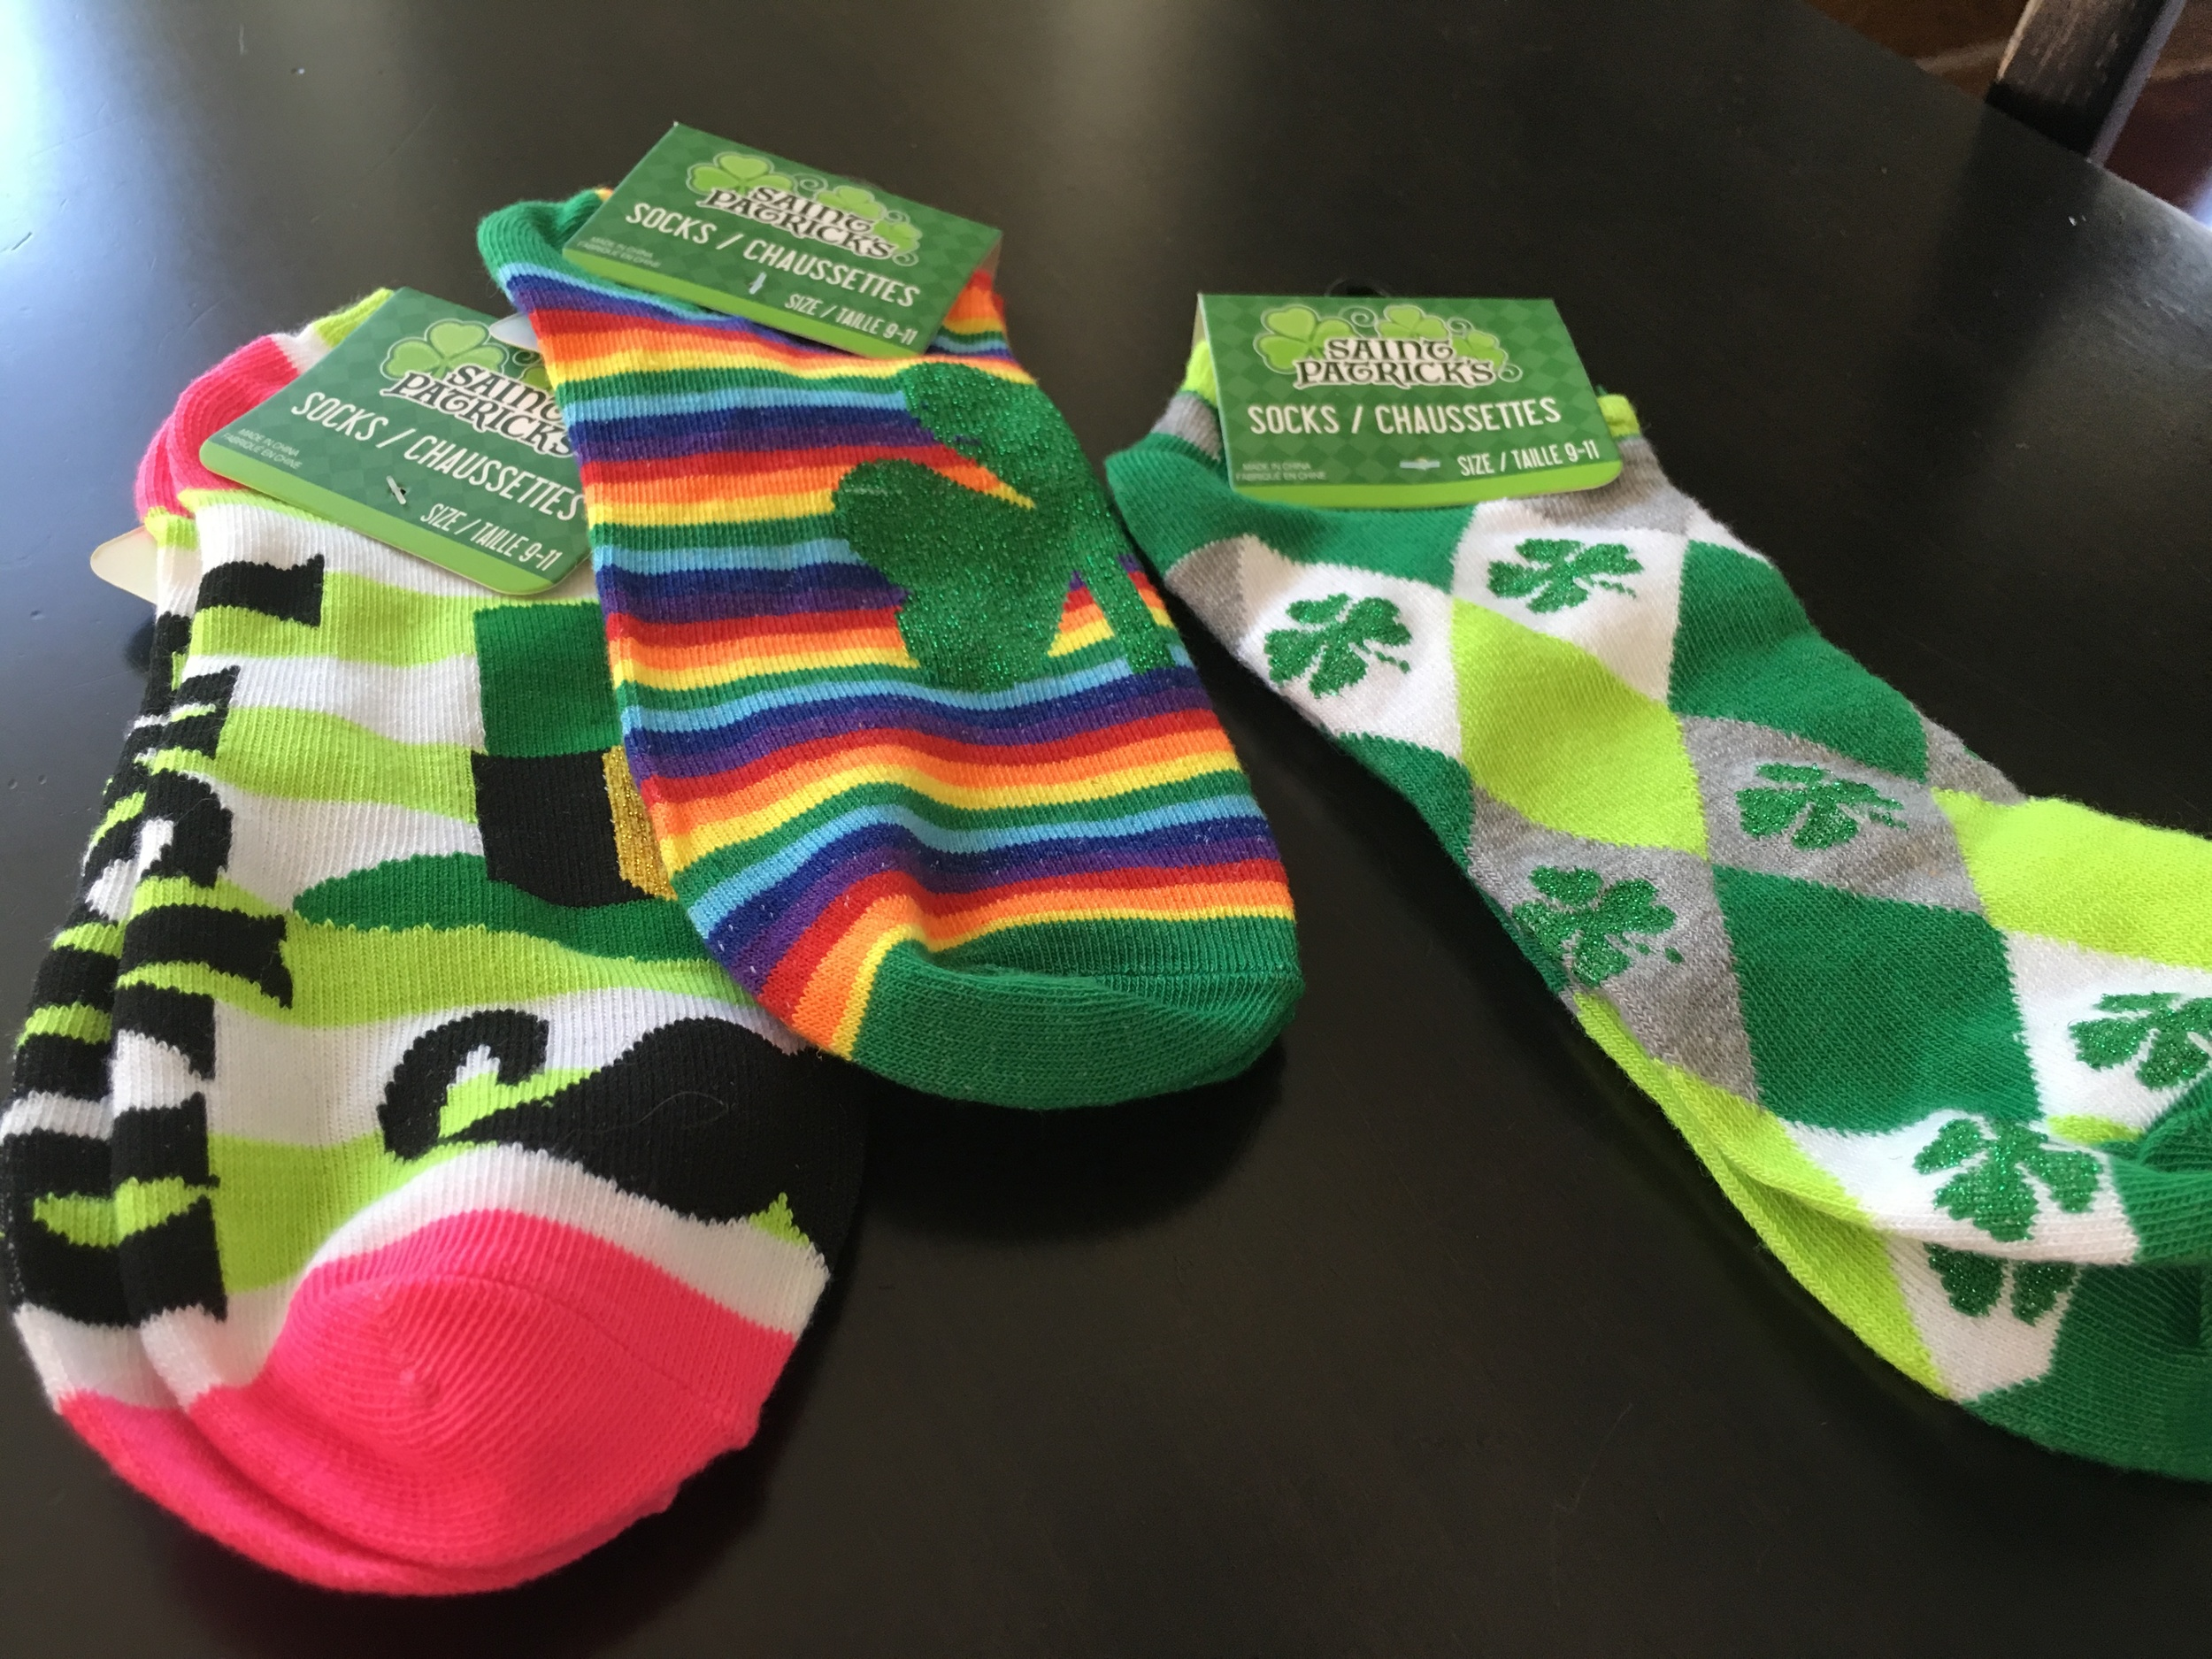 Socks from Dollar Tree - $1 each.